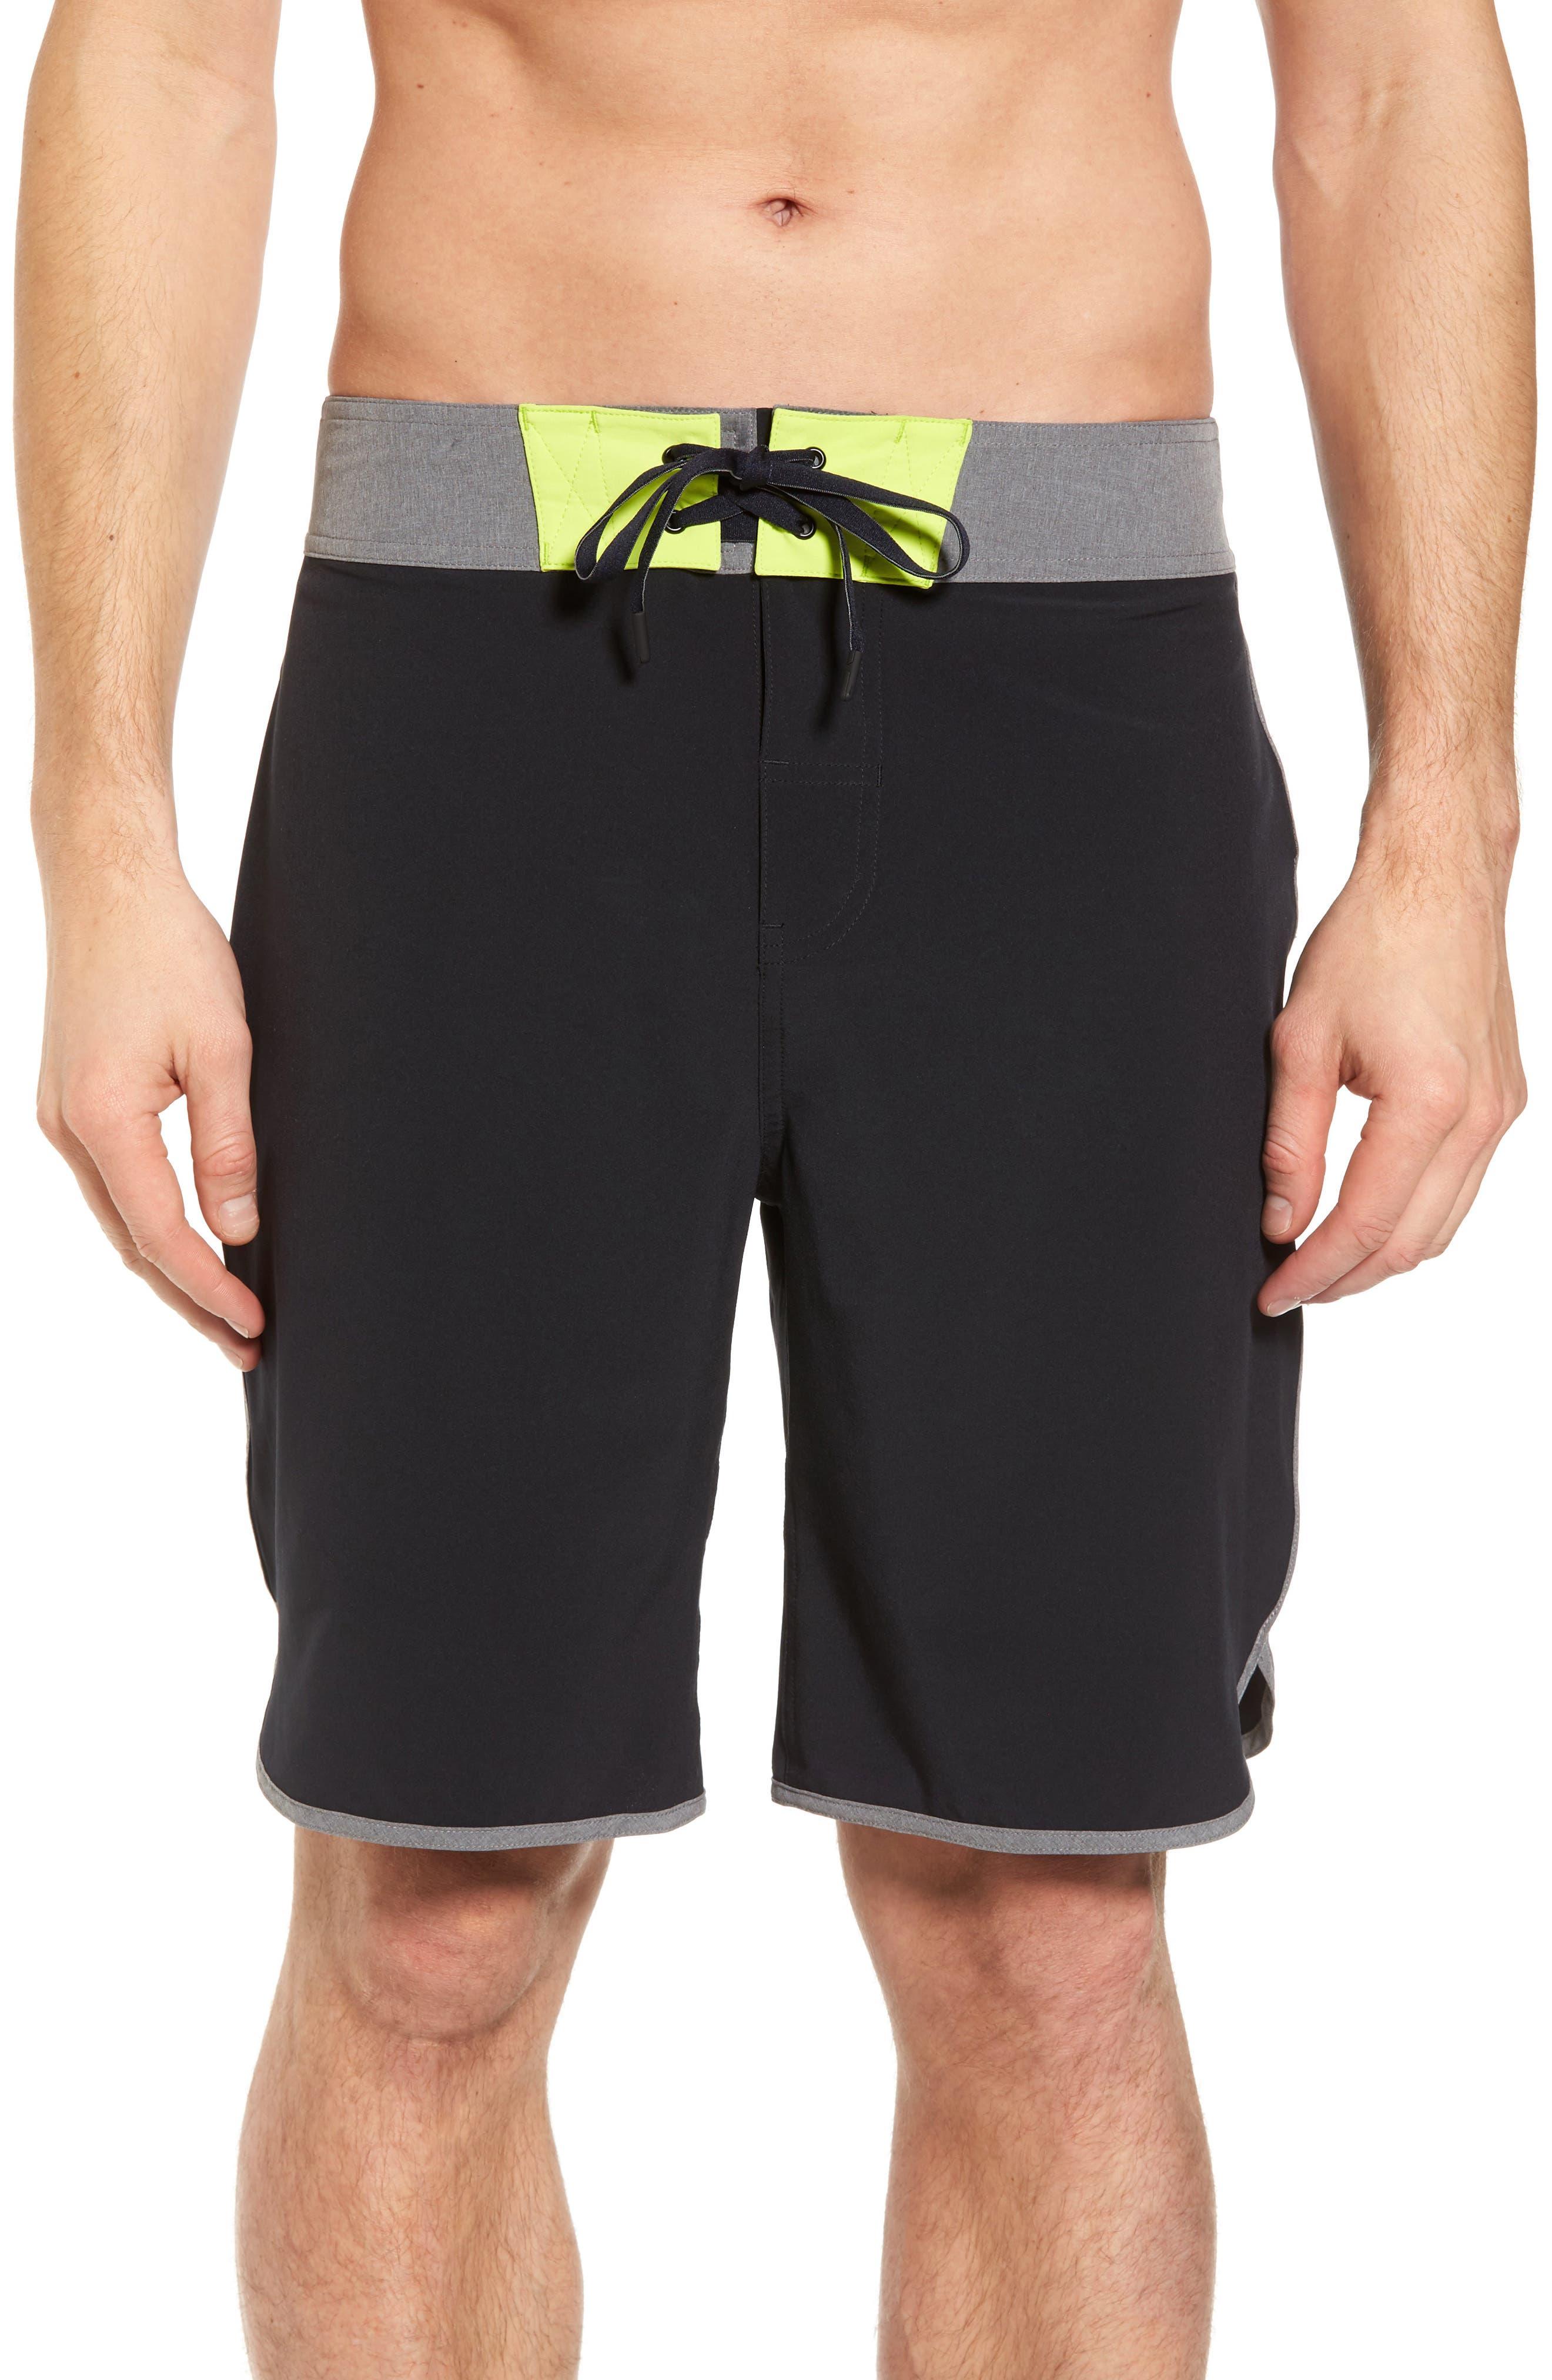 Flex Hybrid Athletic Shorts,                         Main,                         color, 001